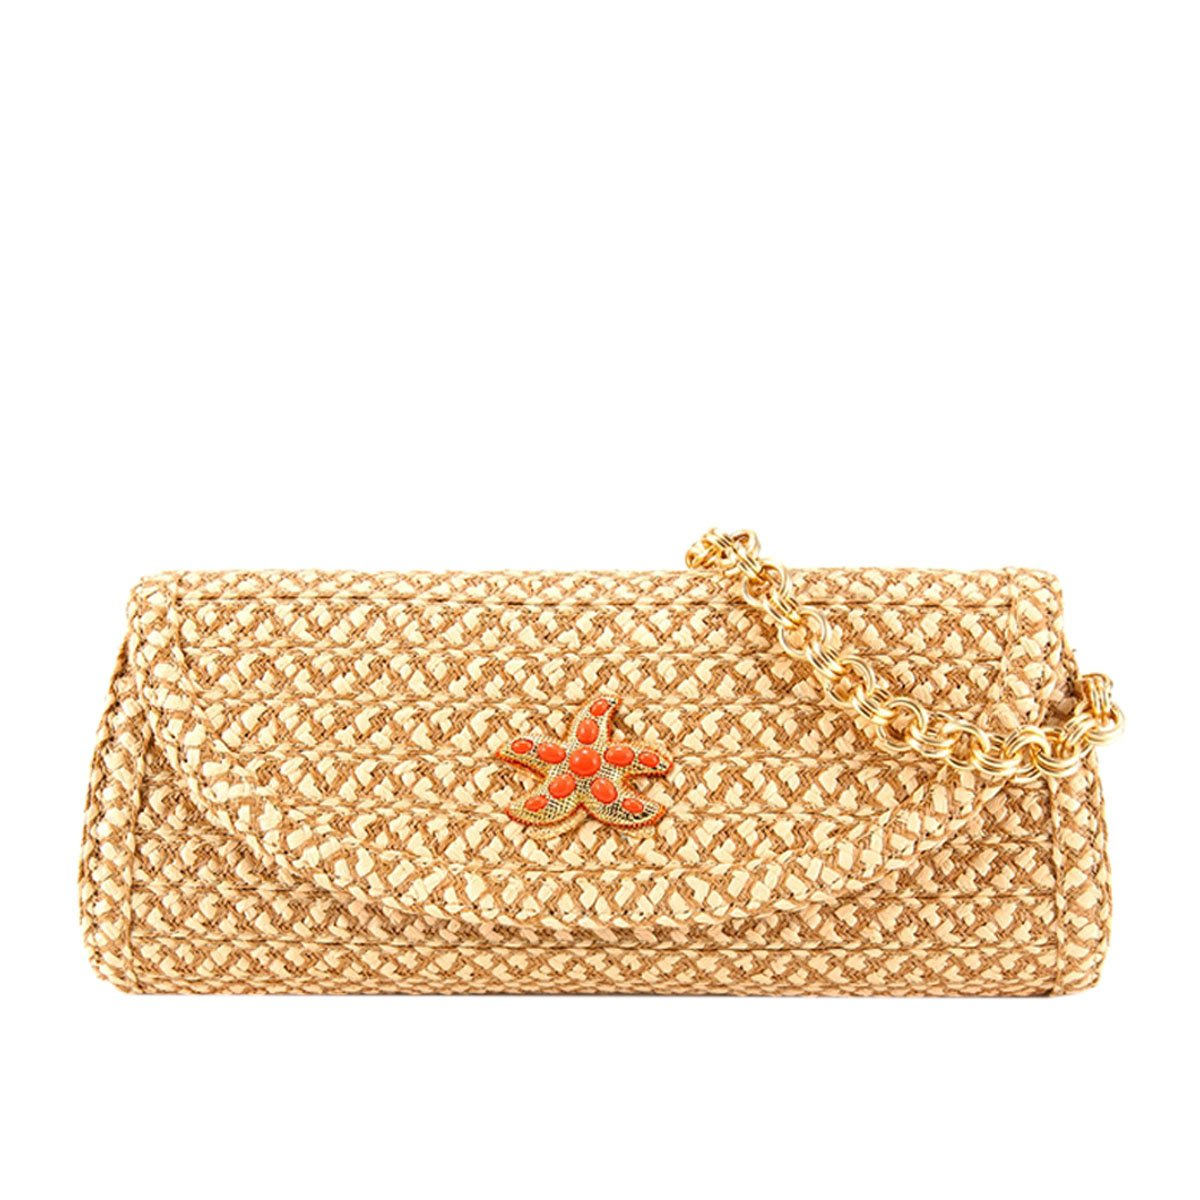 Eric Javits Luxury Fashion Designer Women's Handbag - Paradis - Peanut